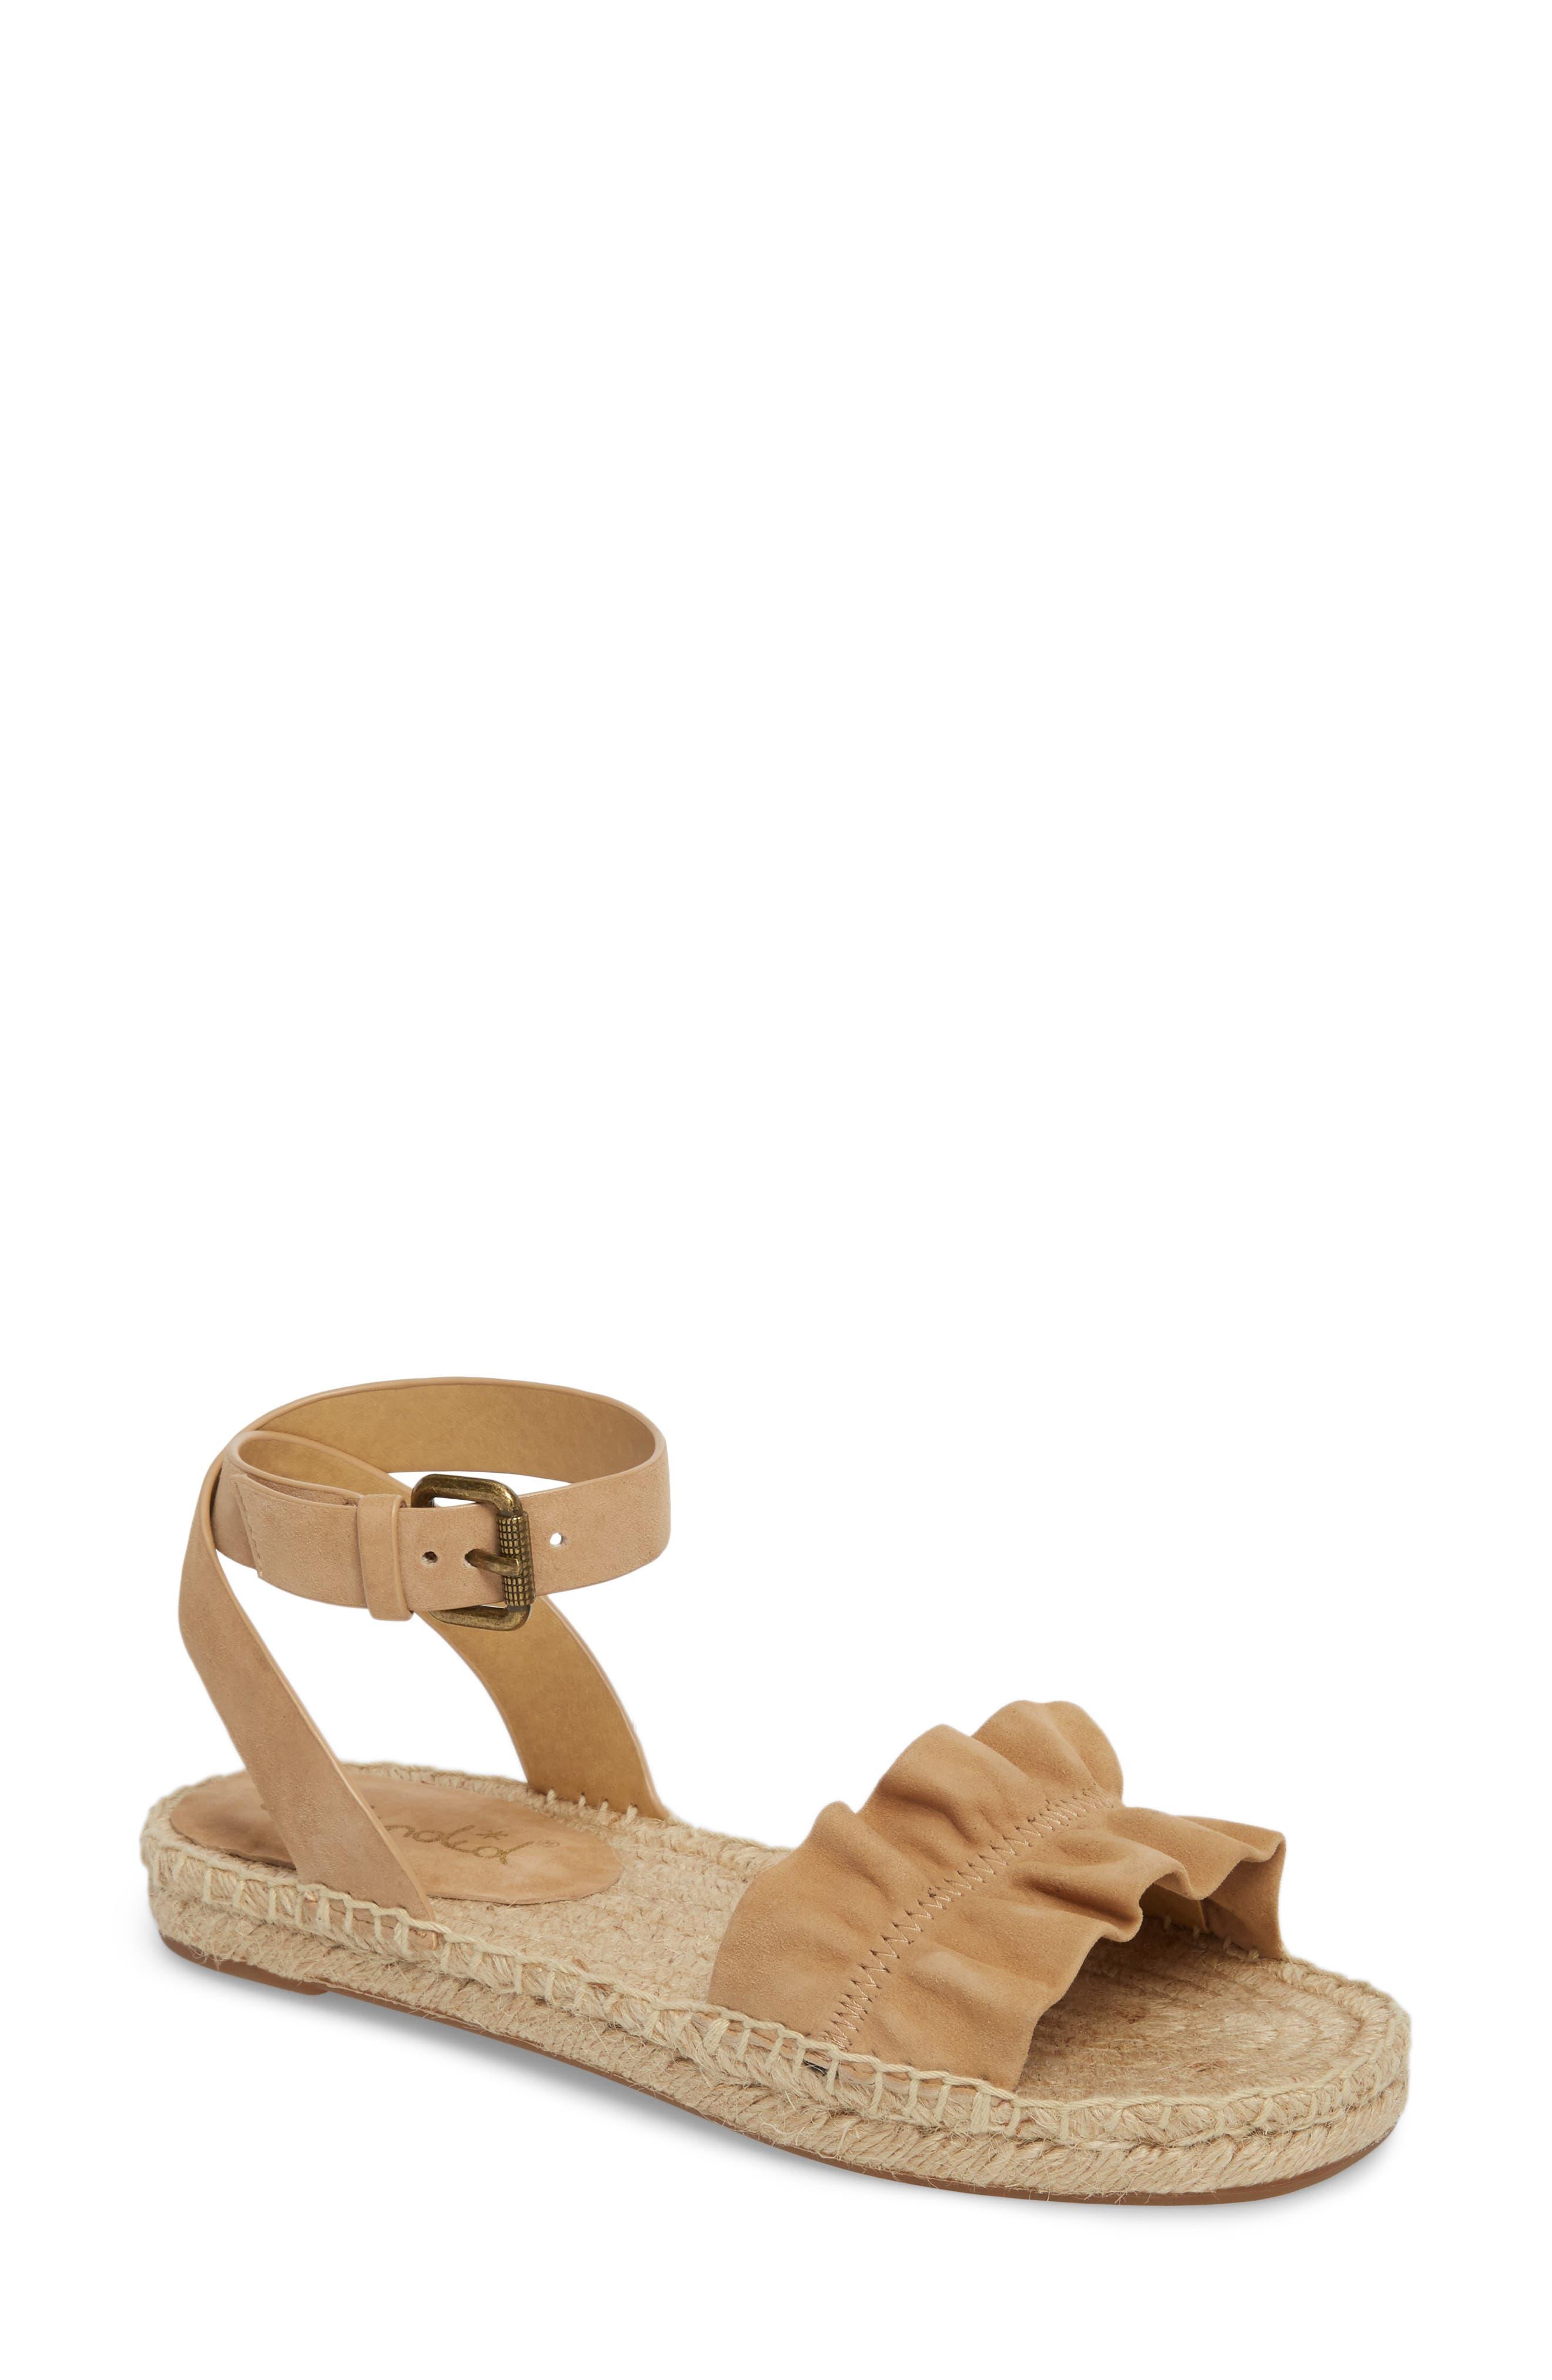 Becca Ruffled Espadrille Sandal,                         Main,                         color, 021